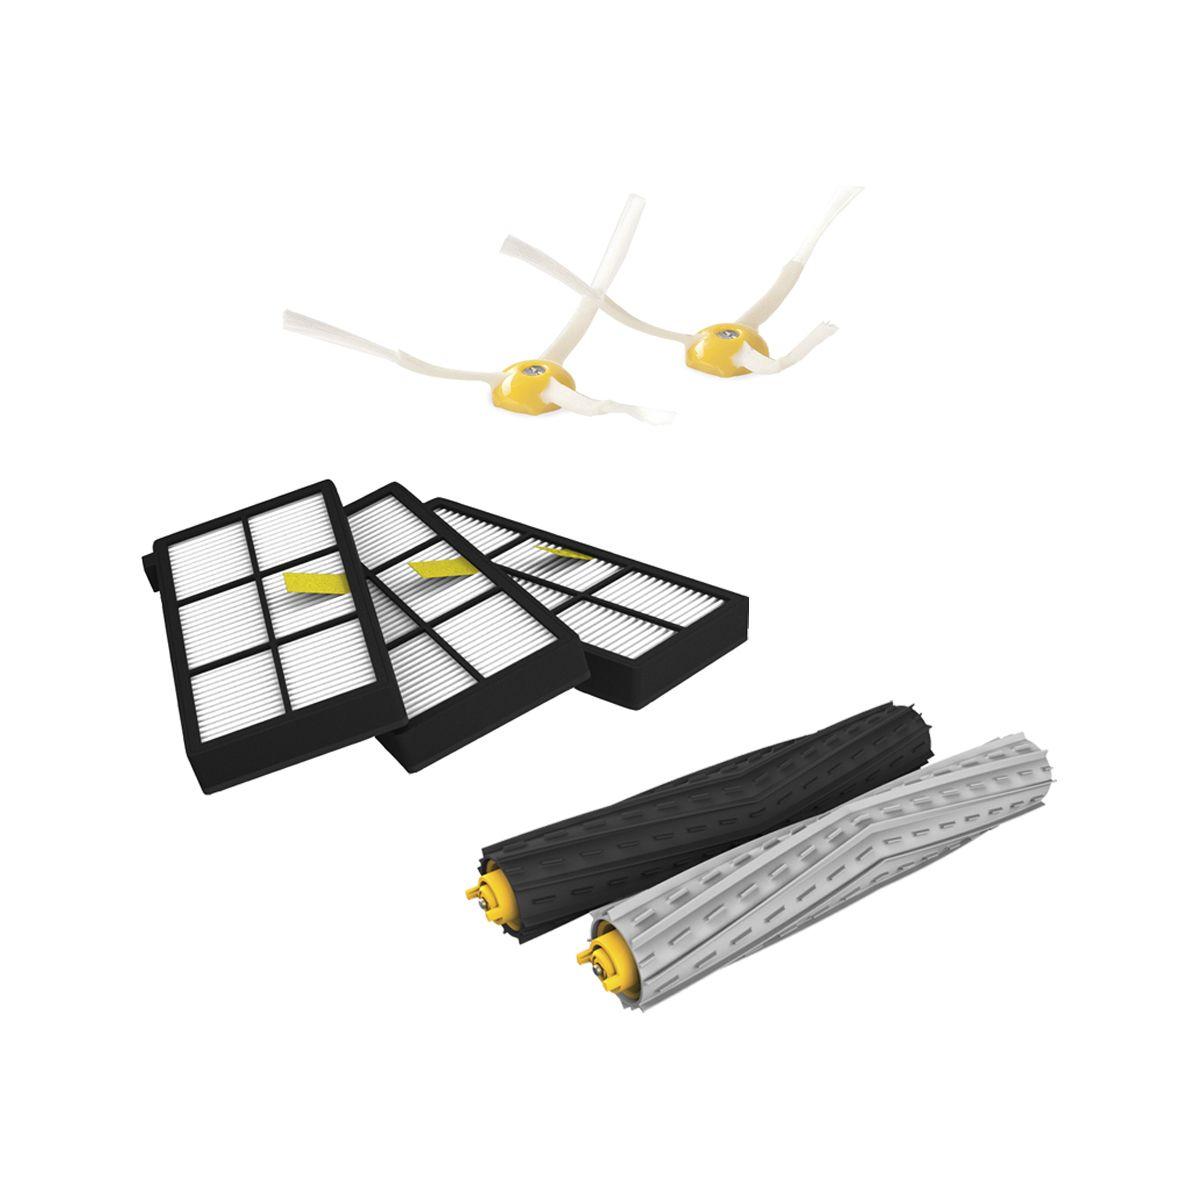 Kit IROBOT Kit de remplacement série 800/900